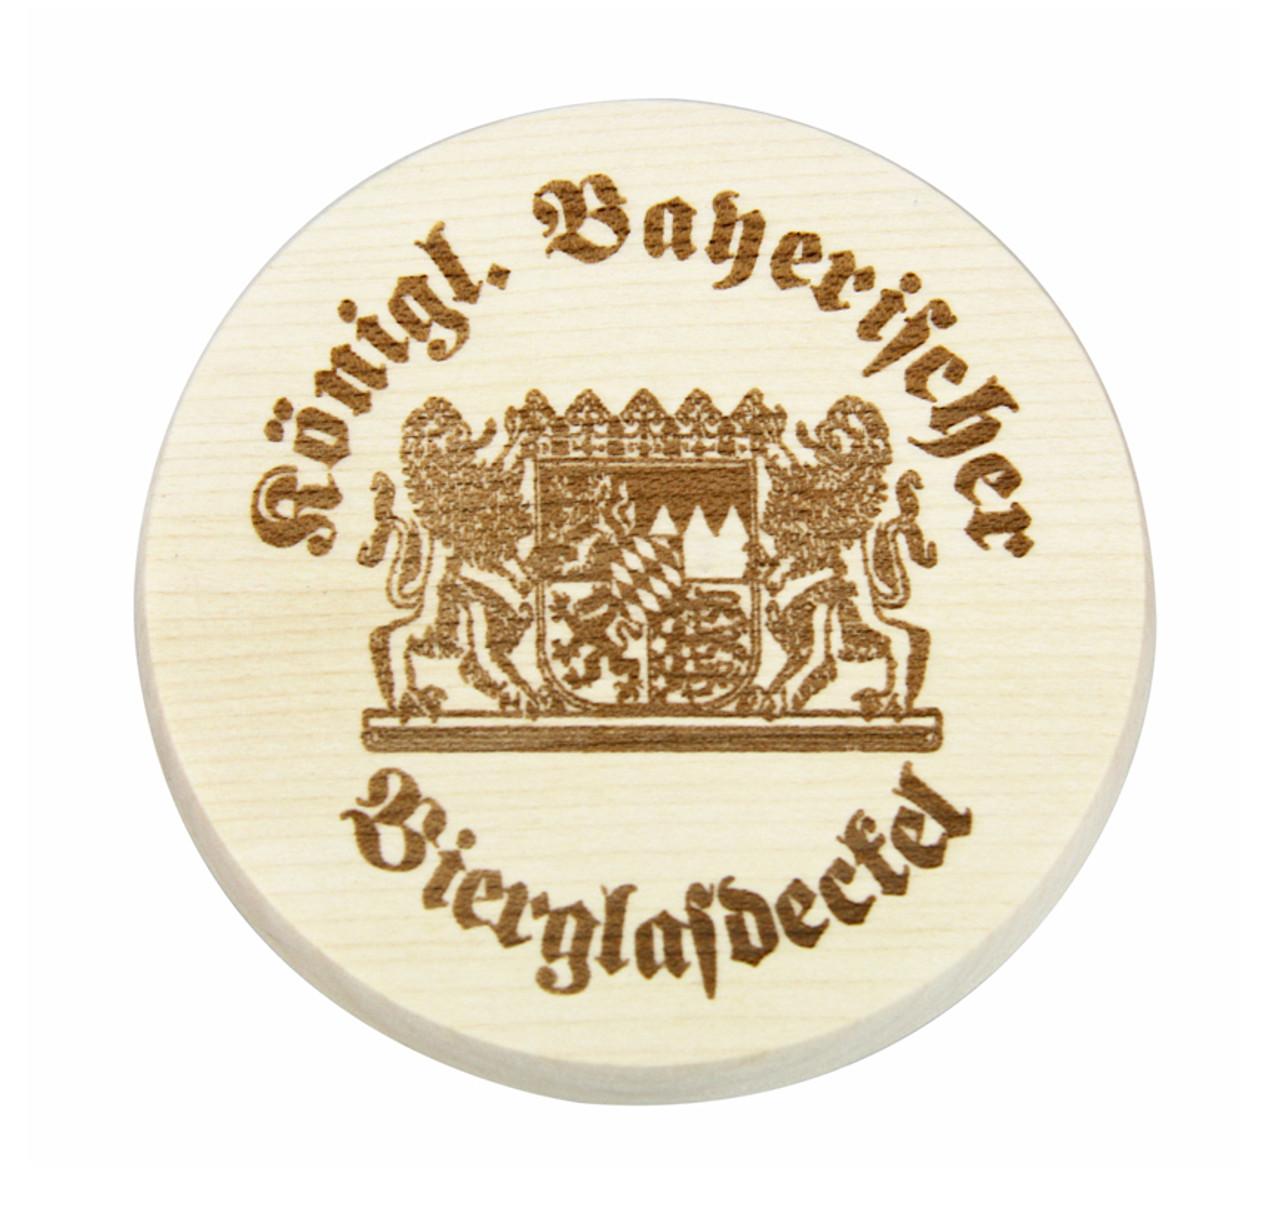 Royal Bavarian Beer Glass Lid